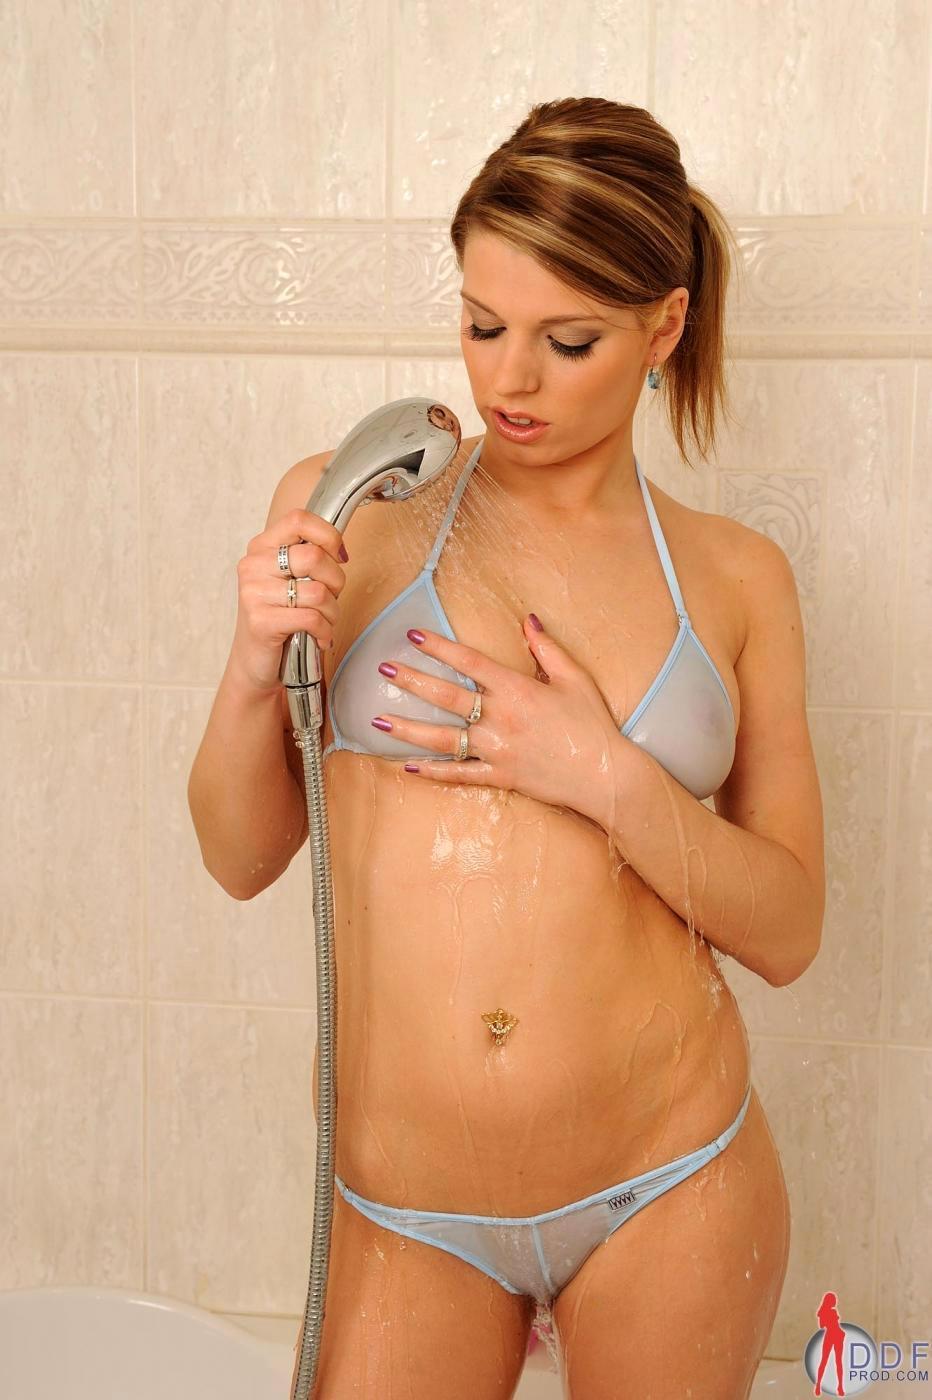 Monalee in lingerie - breasts